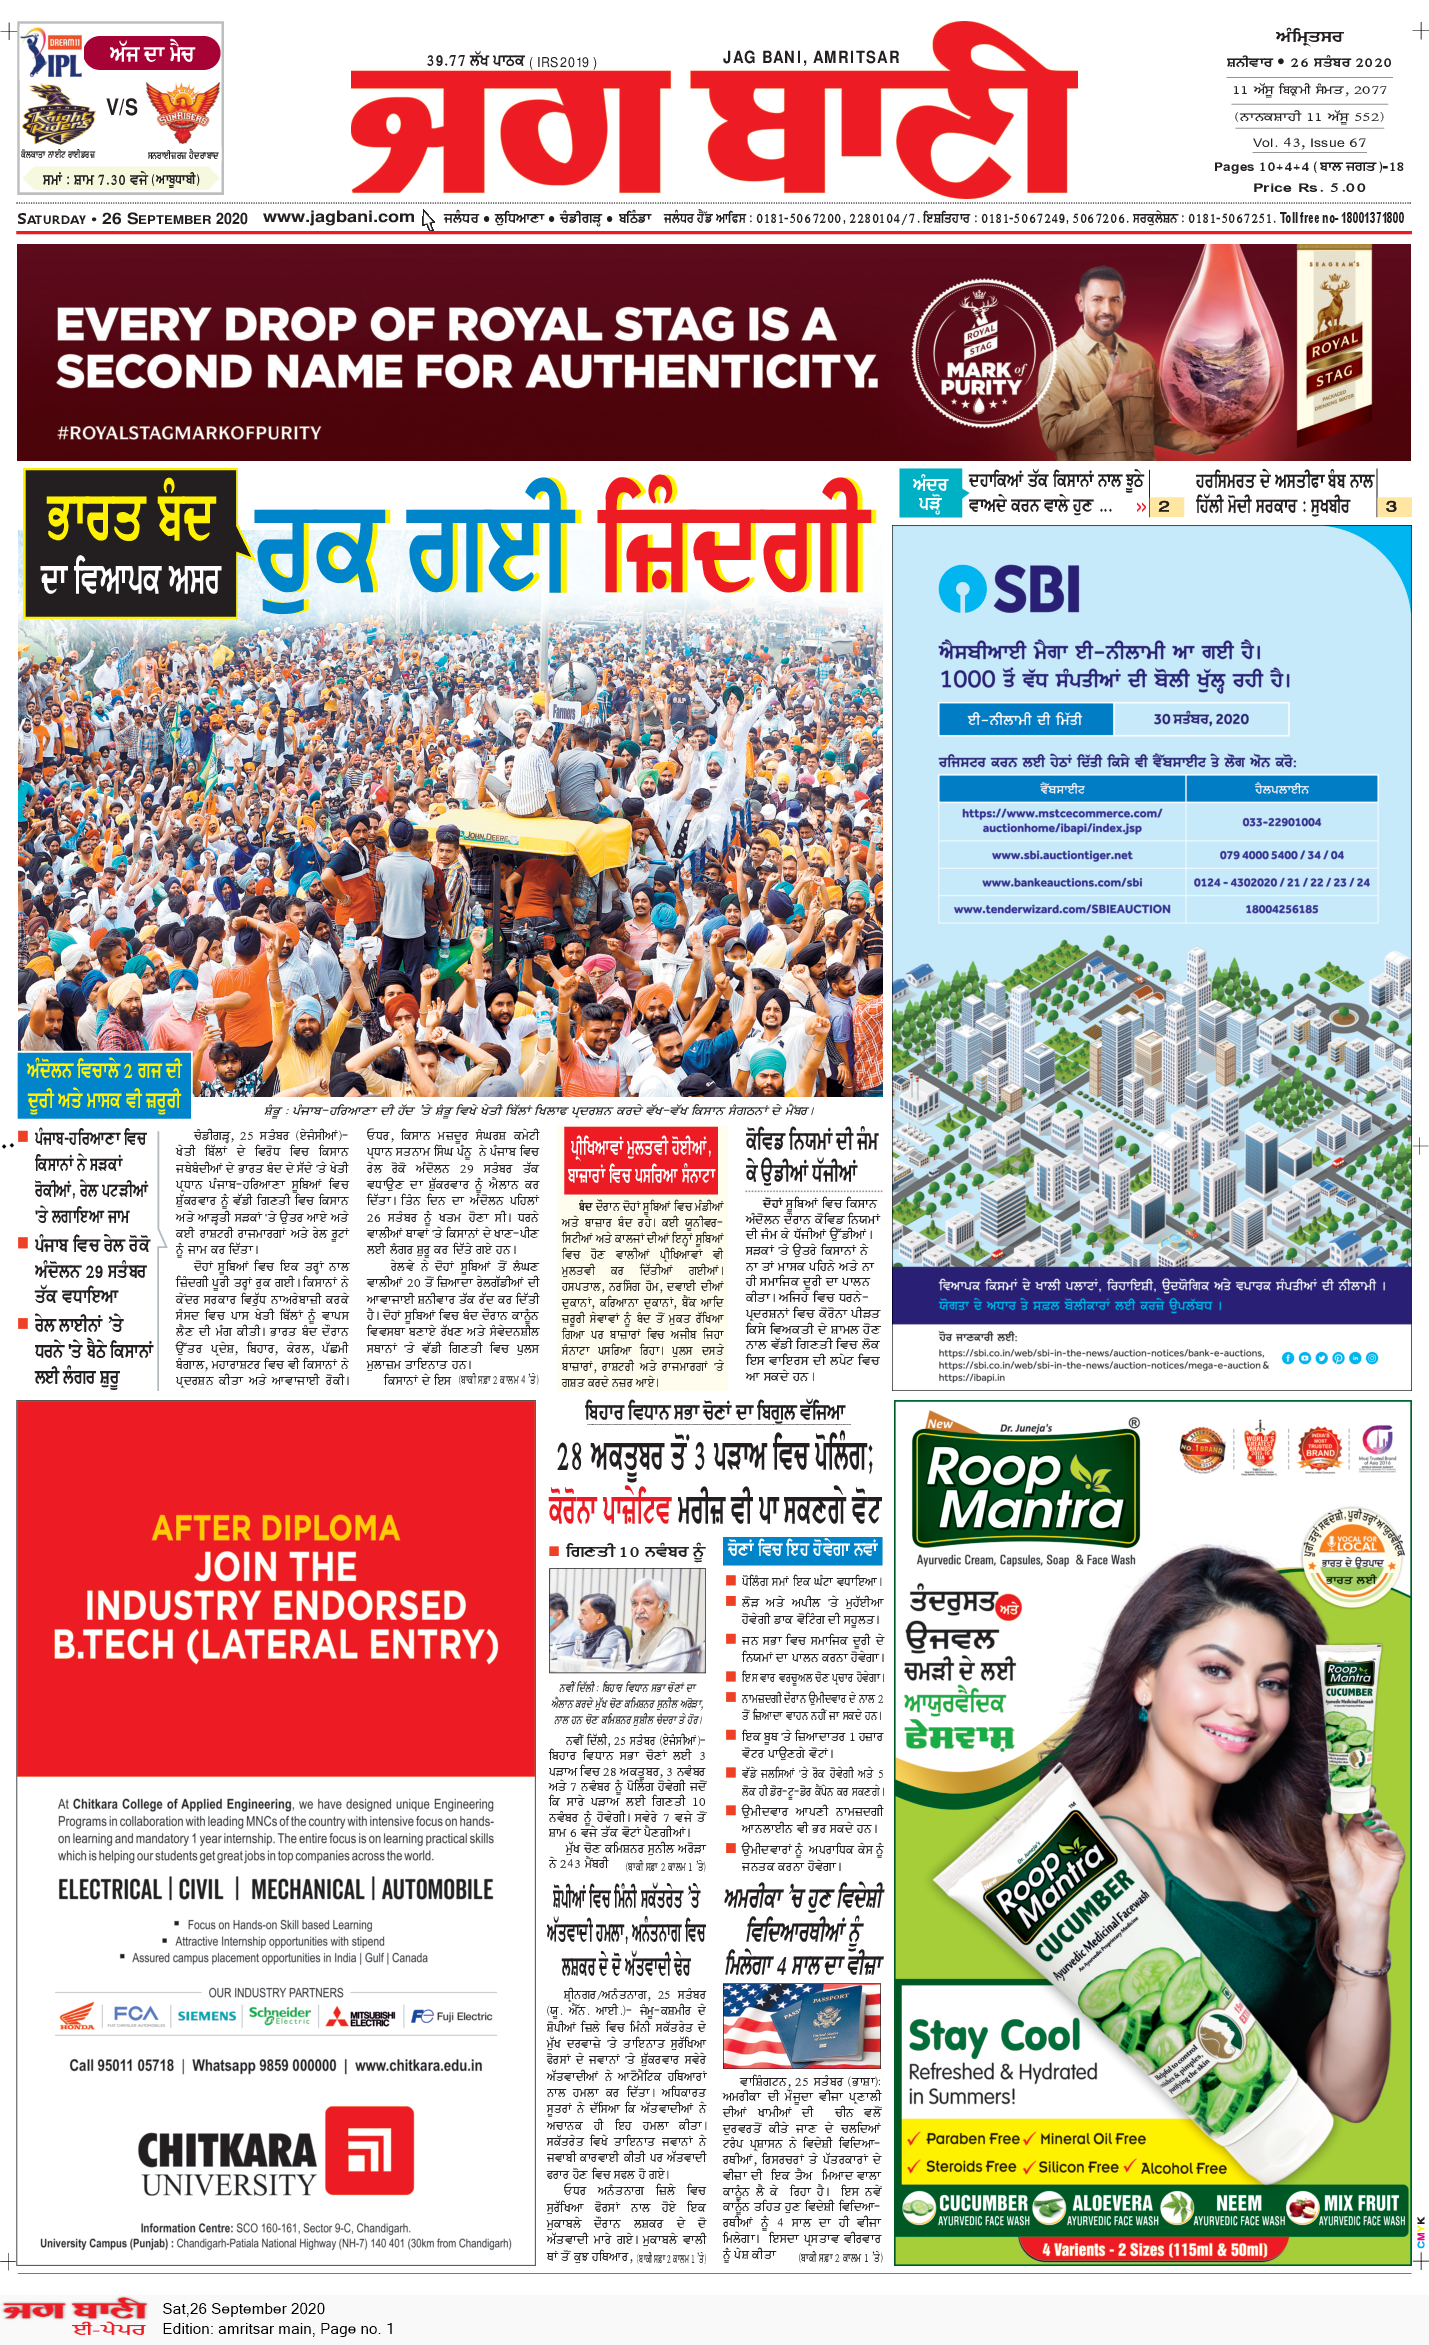 Amritsar Main 9/26/2020 12:00:00 AM